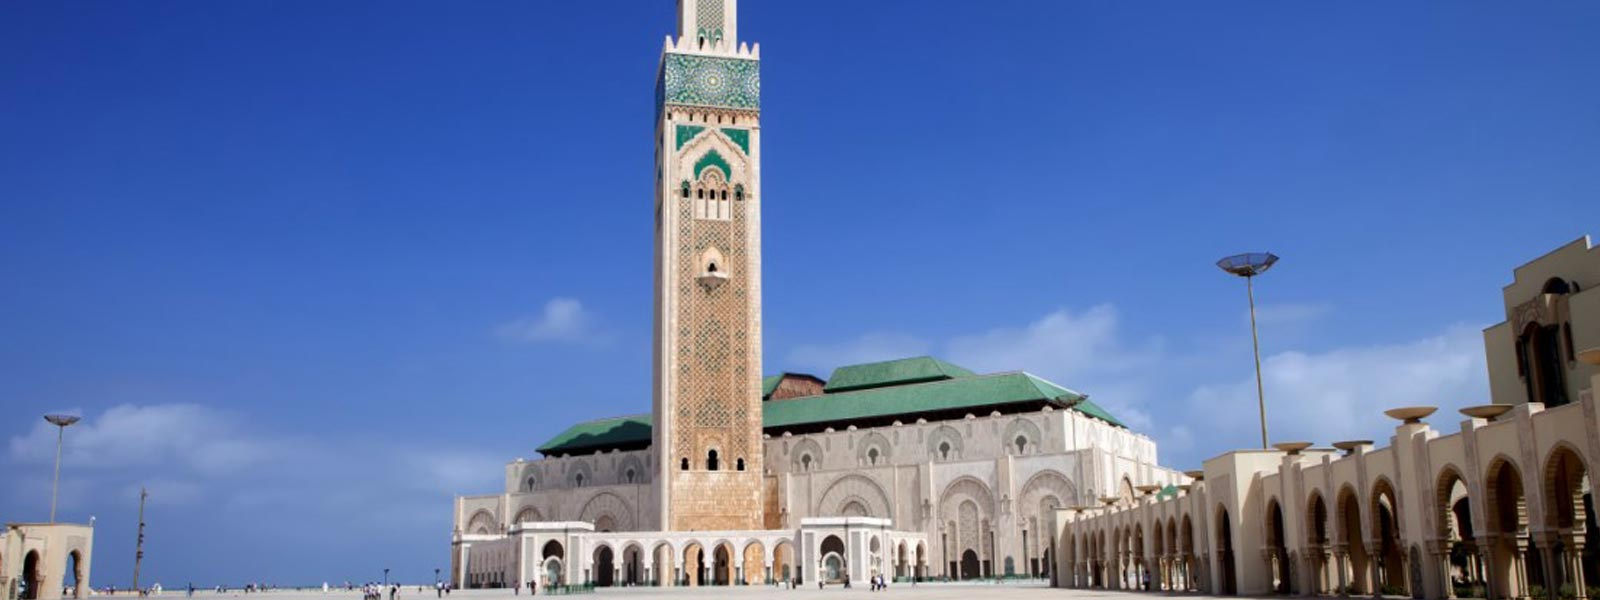 IP VISION - Mosquée Hassan 2